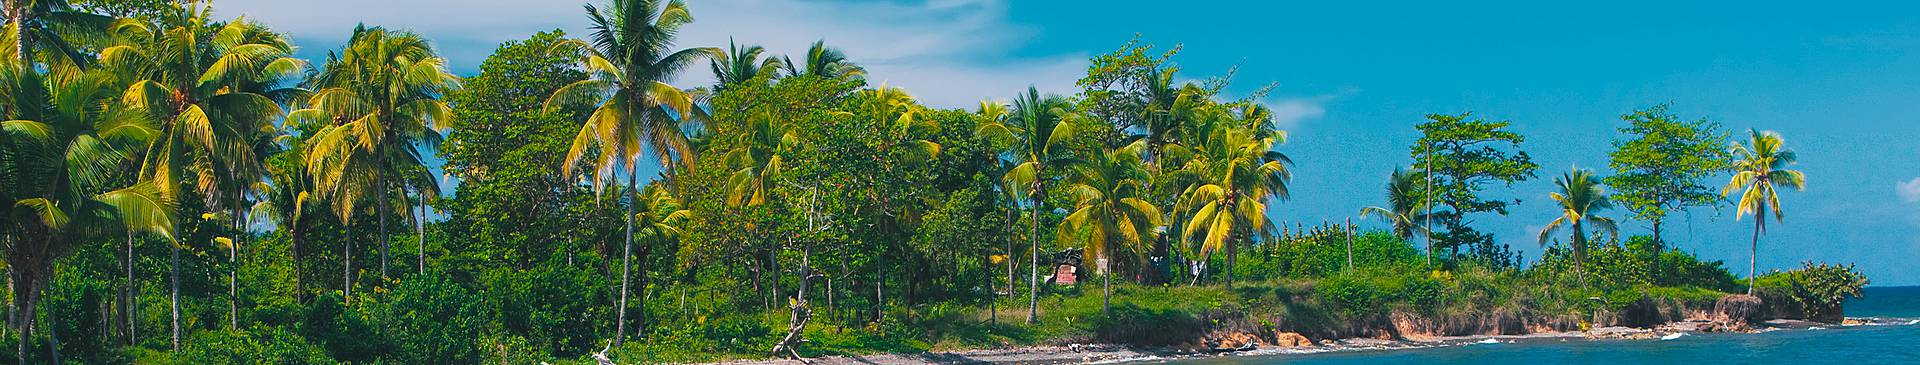 Voyage plage en Jamaïque